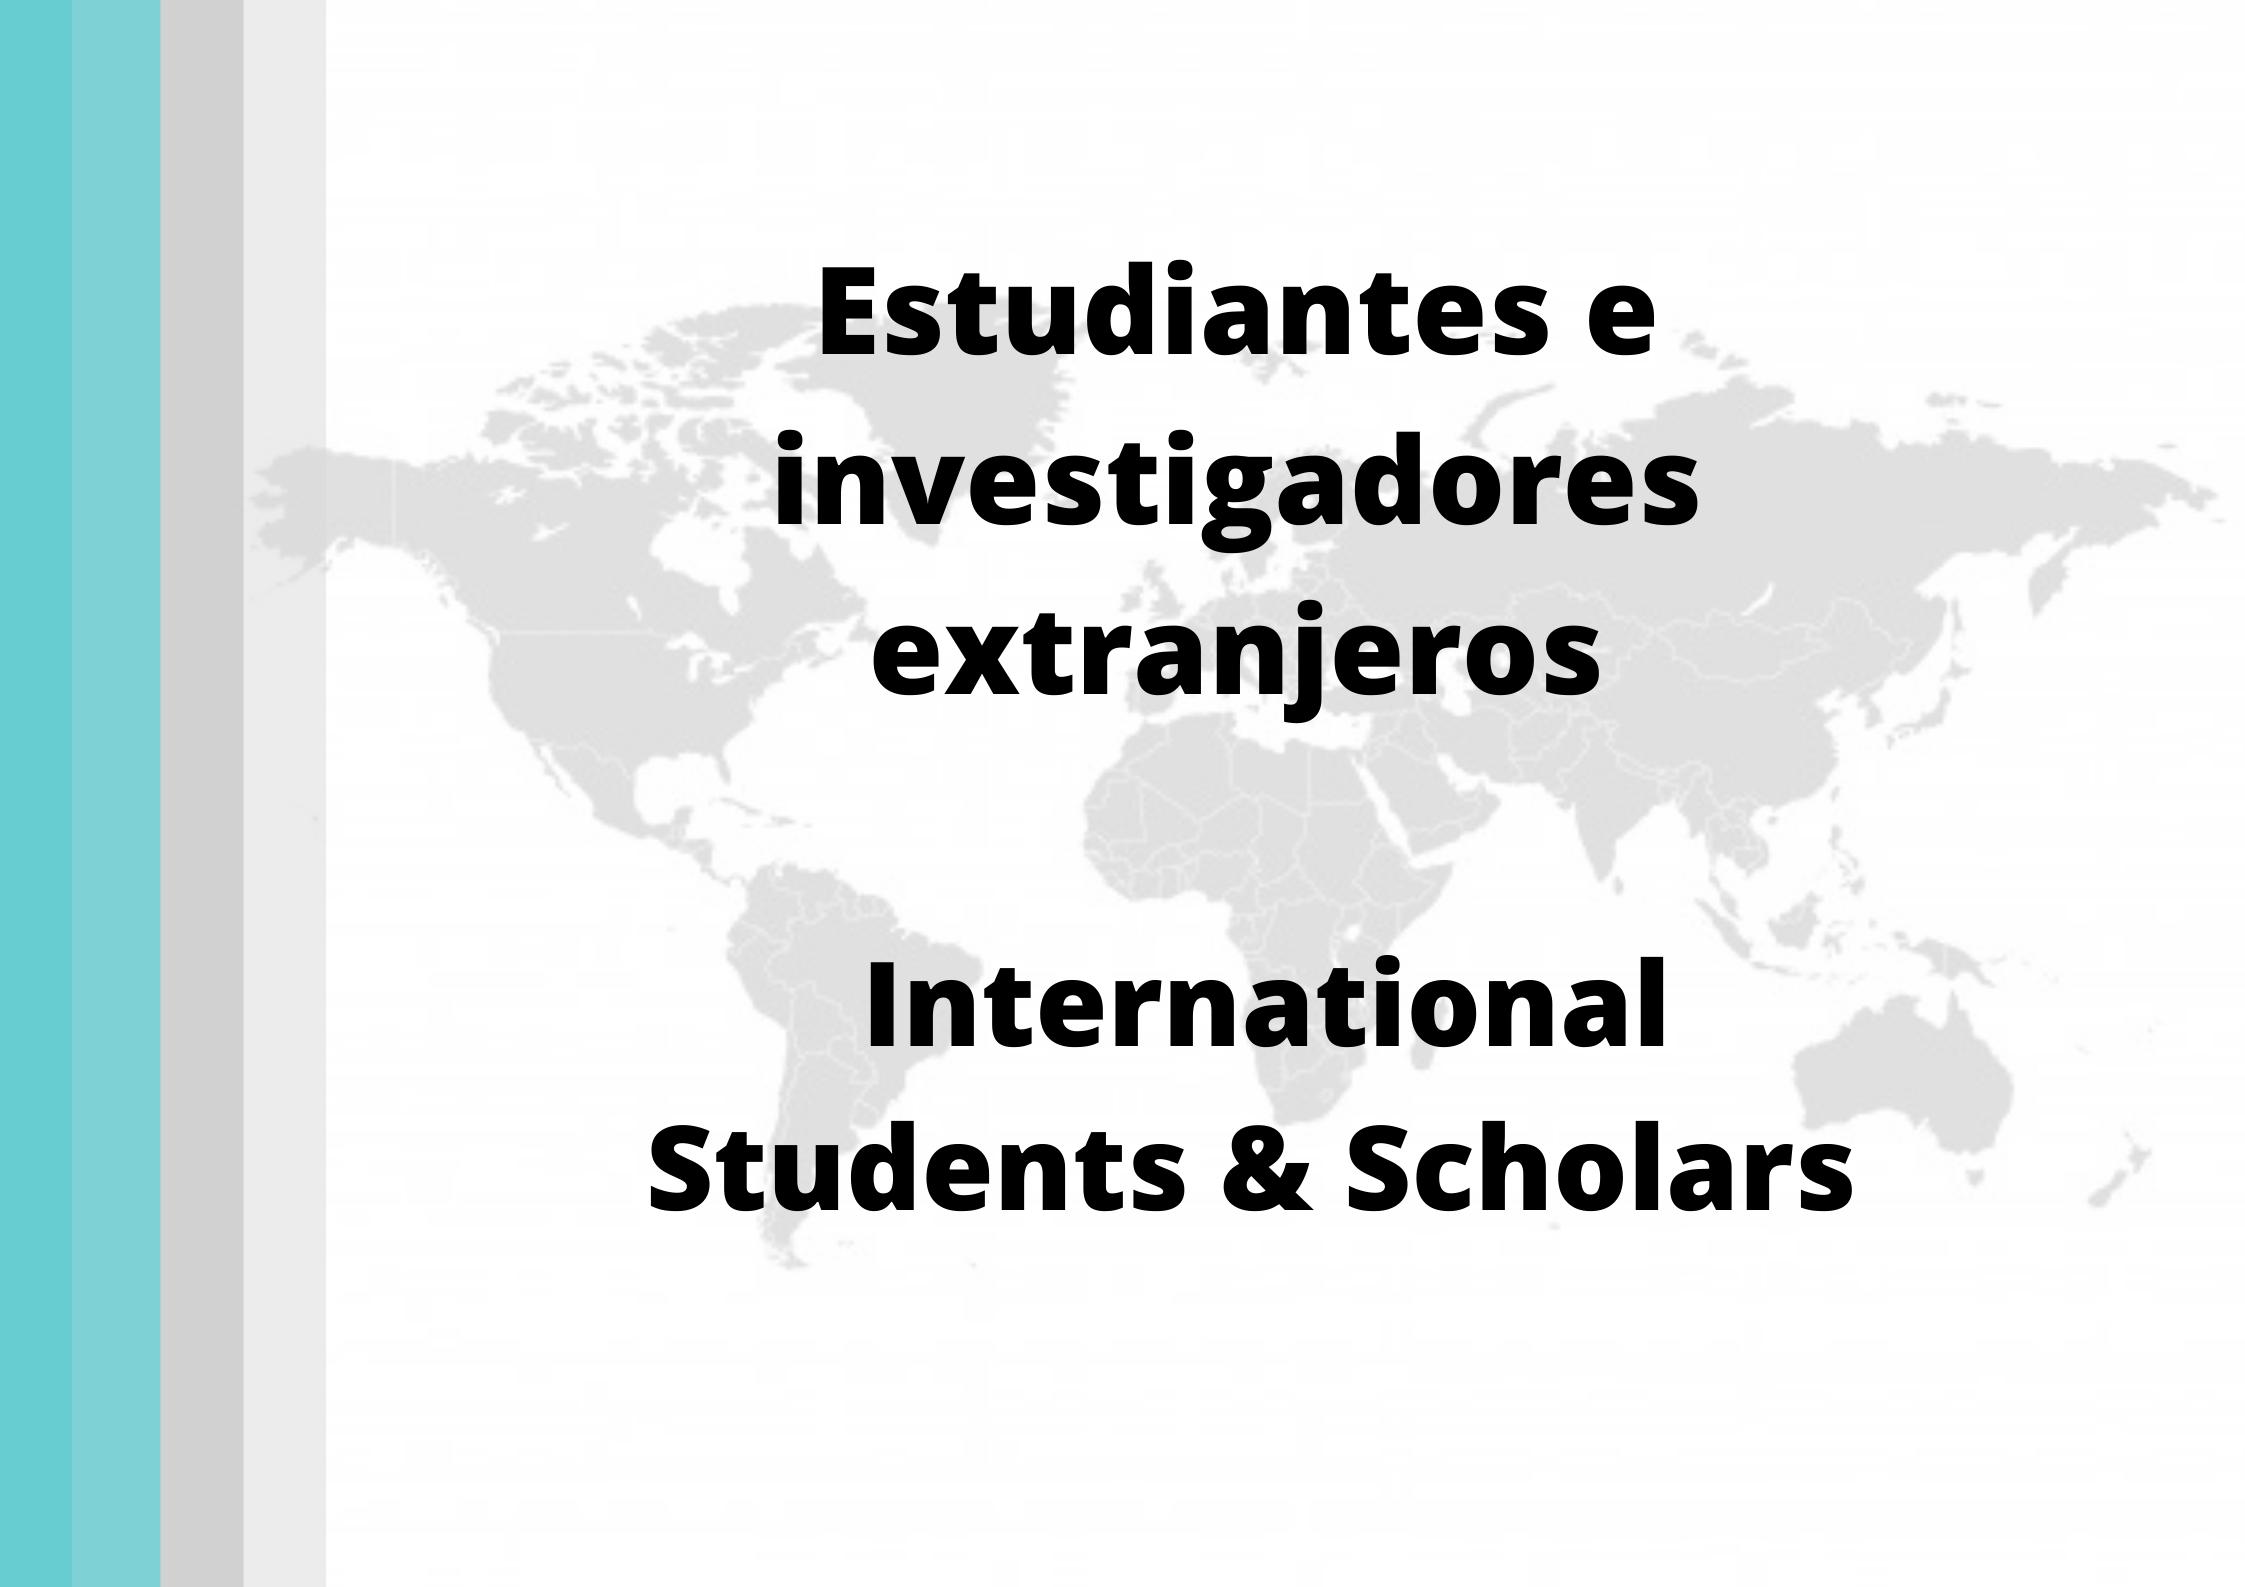 International_Students___Scholars.png